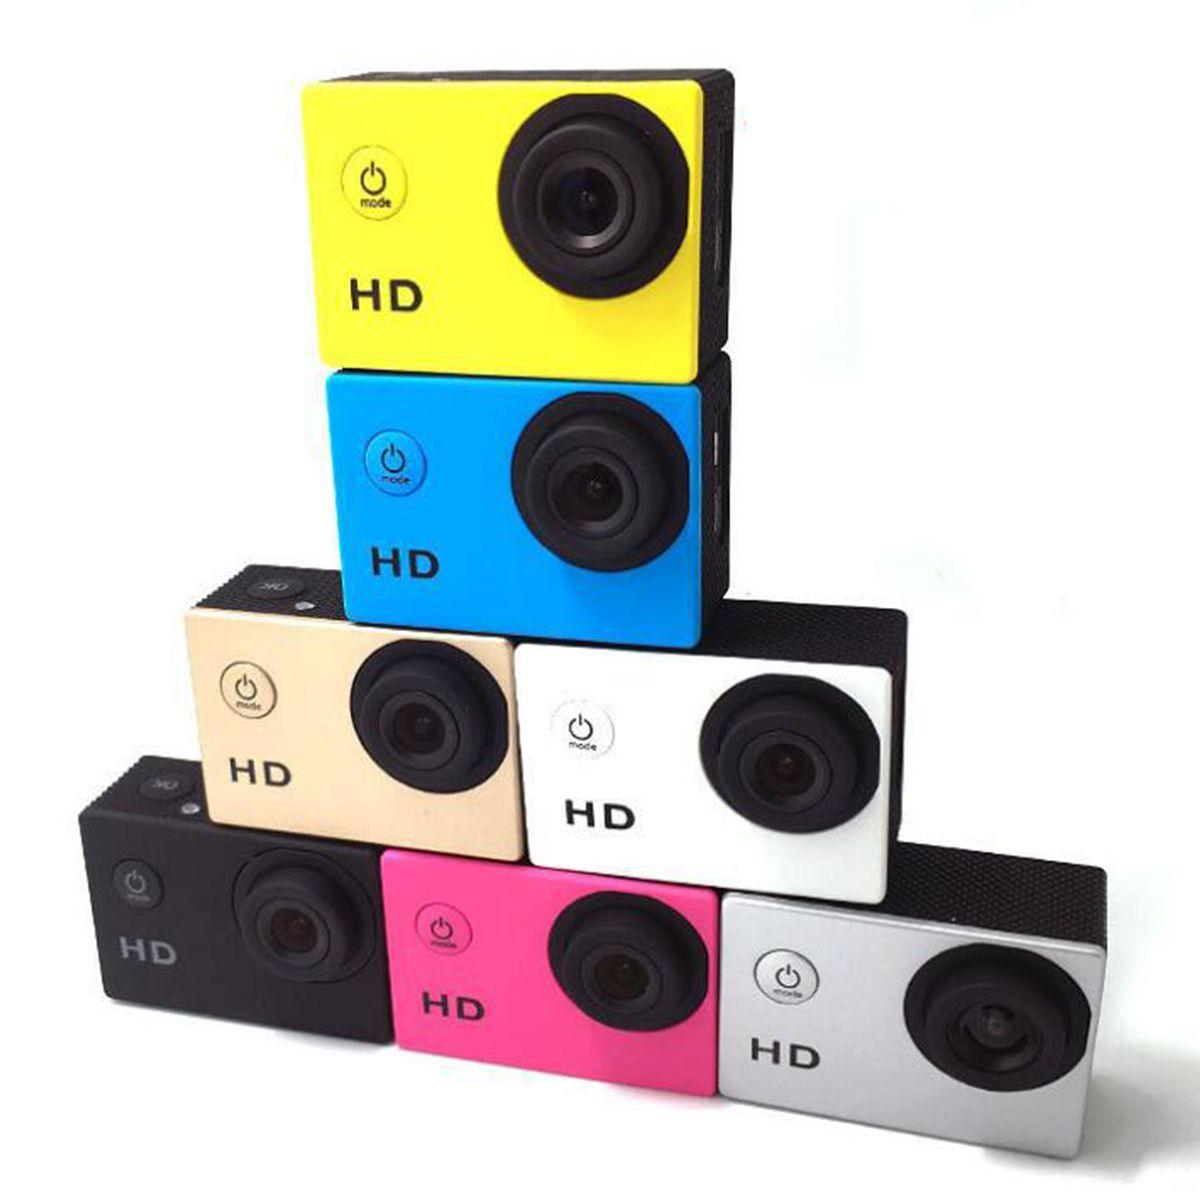 SJ4000 A9 스타일 2 인치 LCD 스크린 미니 스포츠 카메라 1080P 풀 HD 액션 카메라 30M 방수 캠코더 헬멧 스포츠 DV를위한 가장 저렴한 사본